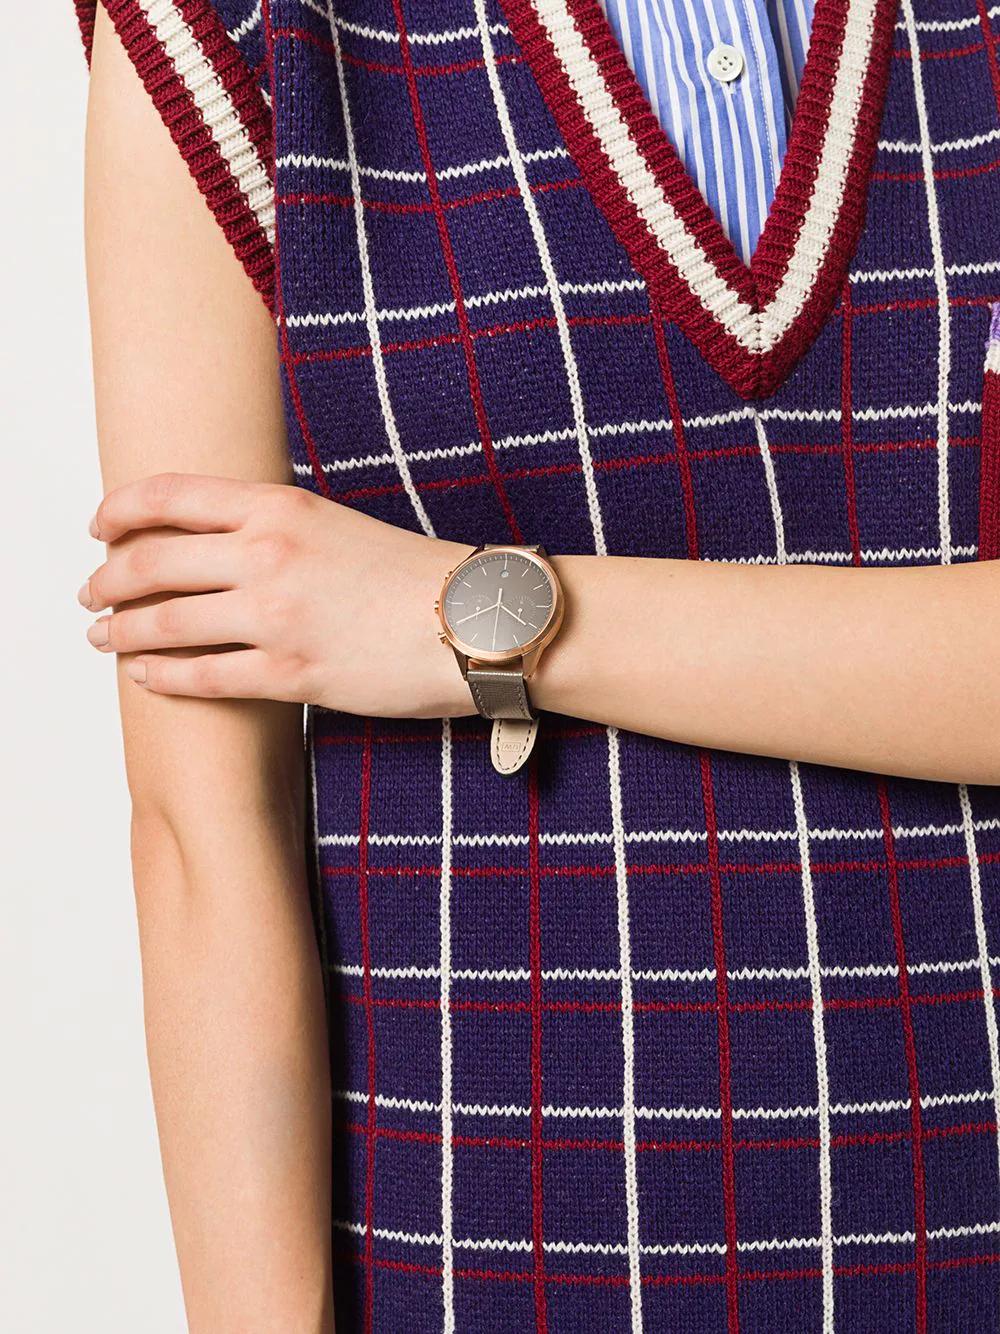 Uniform Wares | Uniform Wares часы 'C39 Chronograph' | Clouty